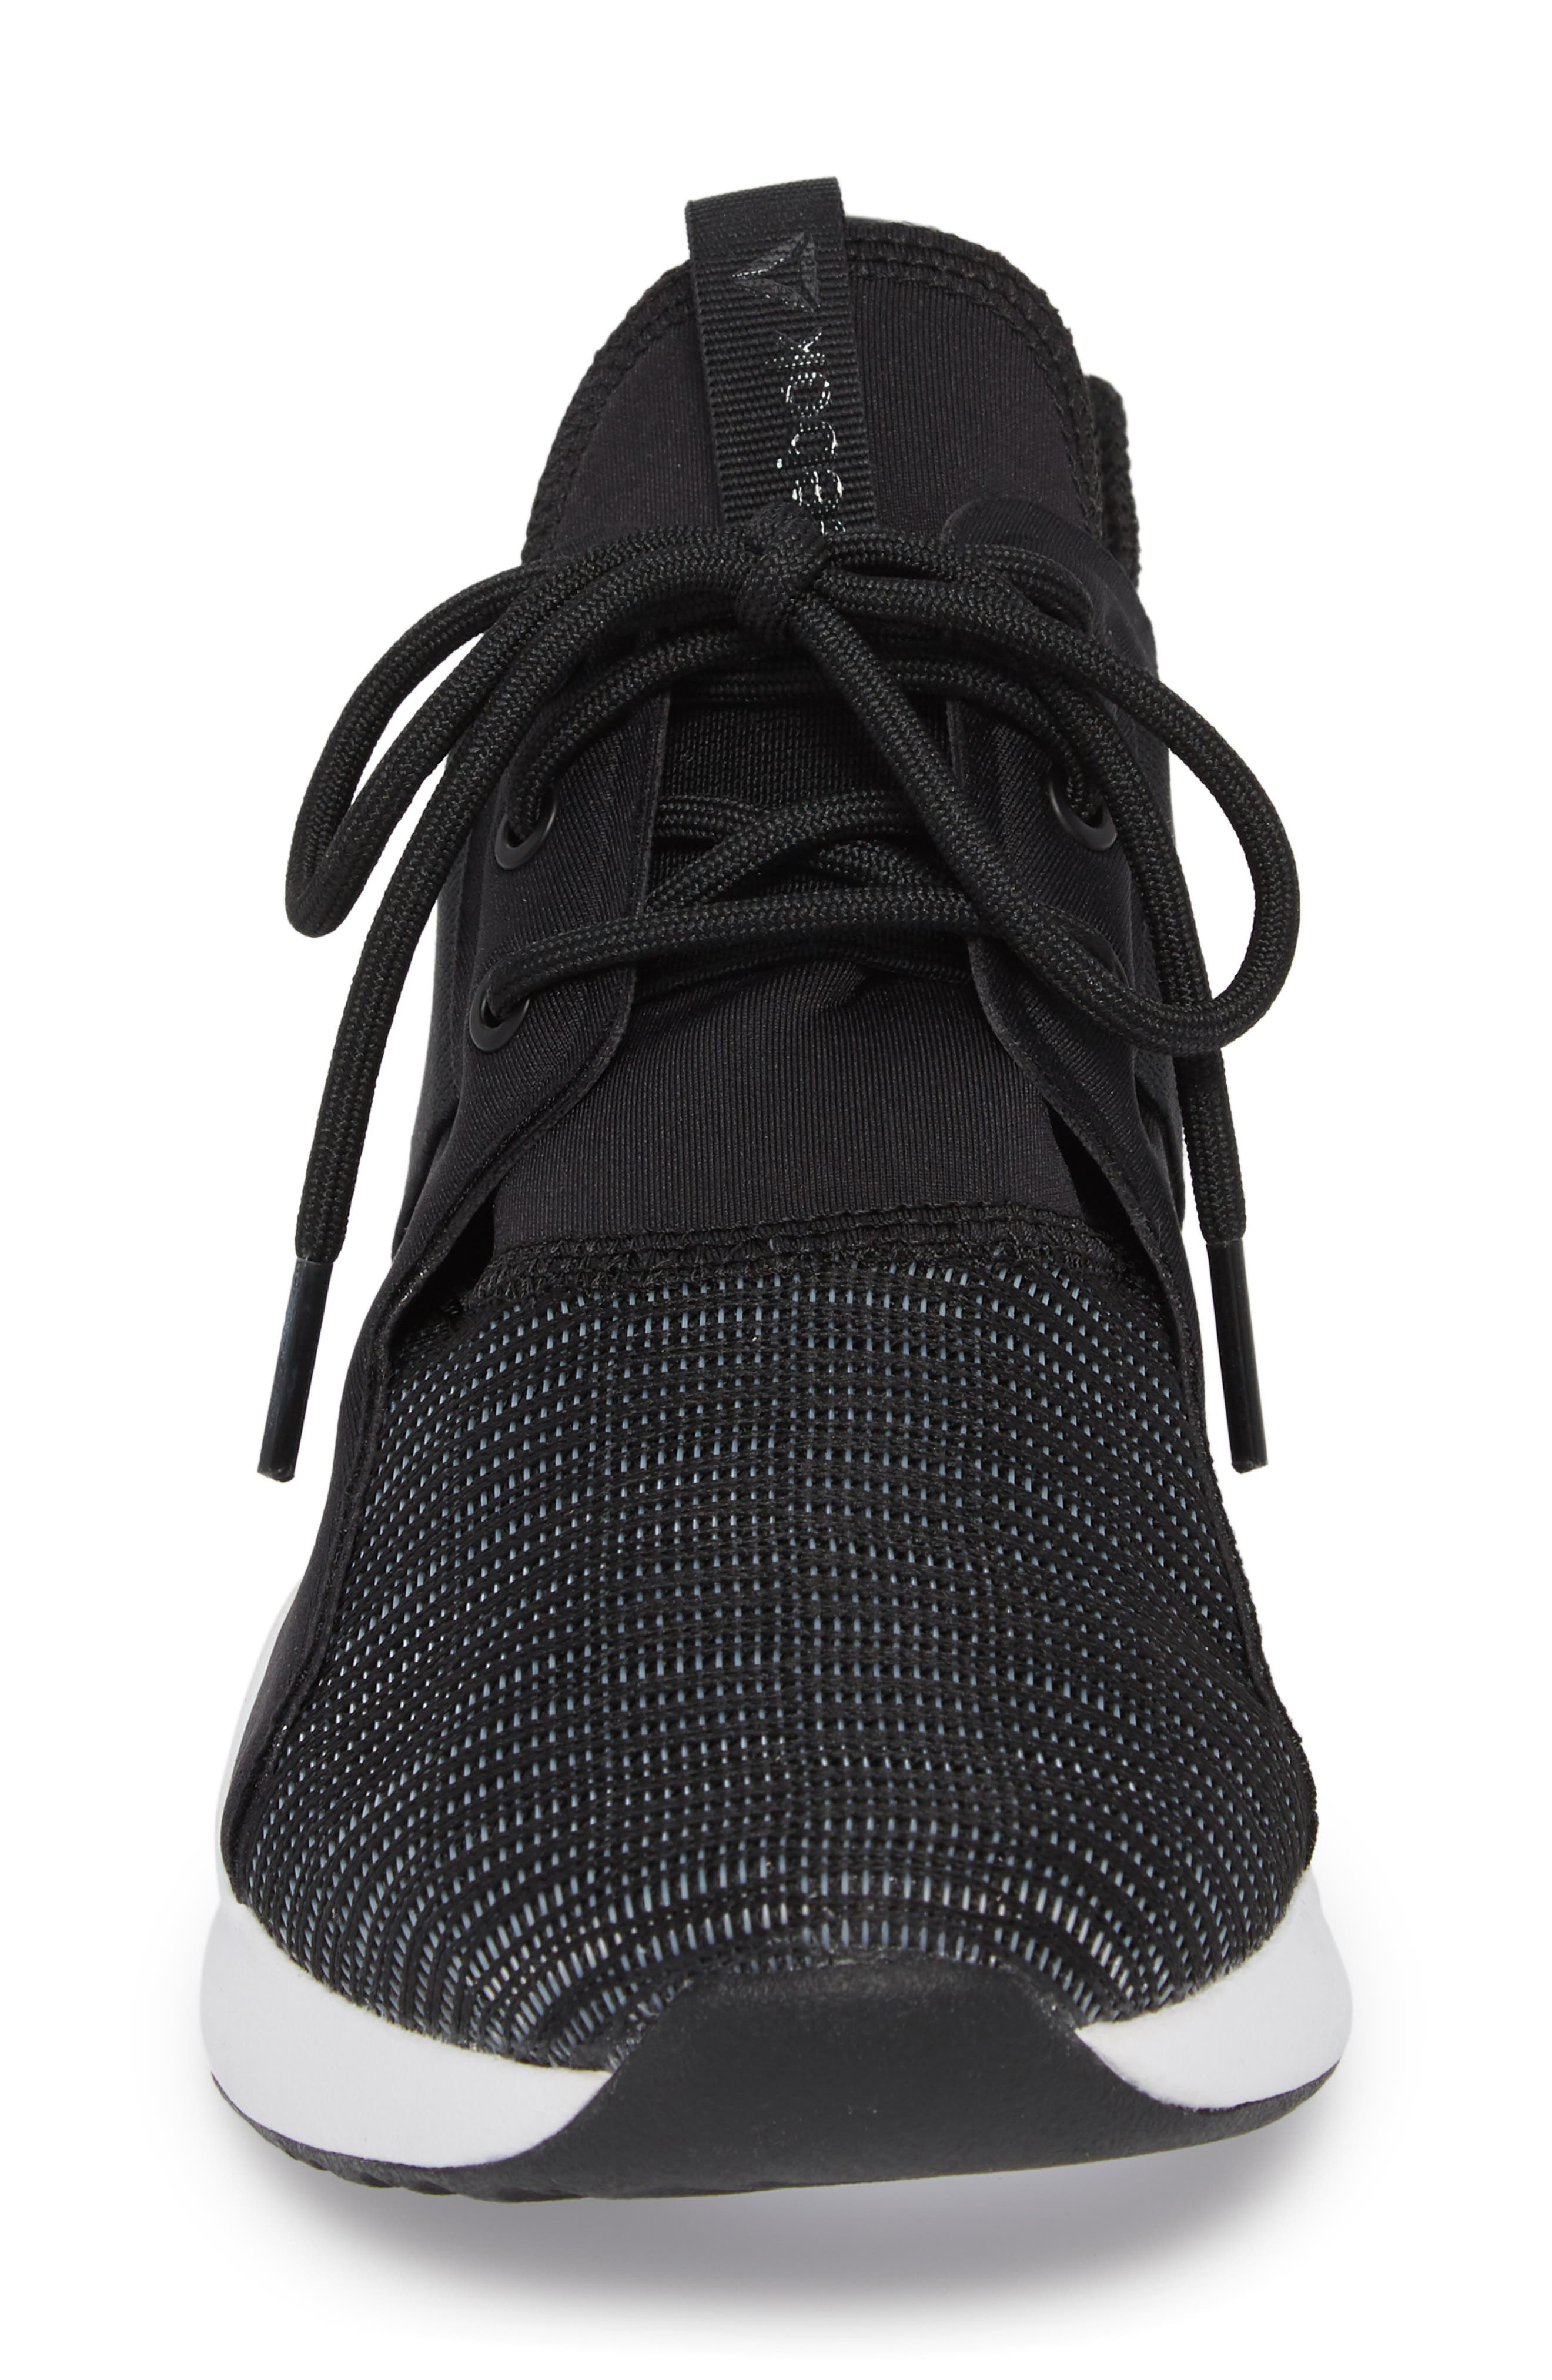 Guresu 1.0 High Top Sneaker,                             Alternate thumbnail 4, color,                             Black/ White